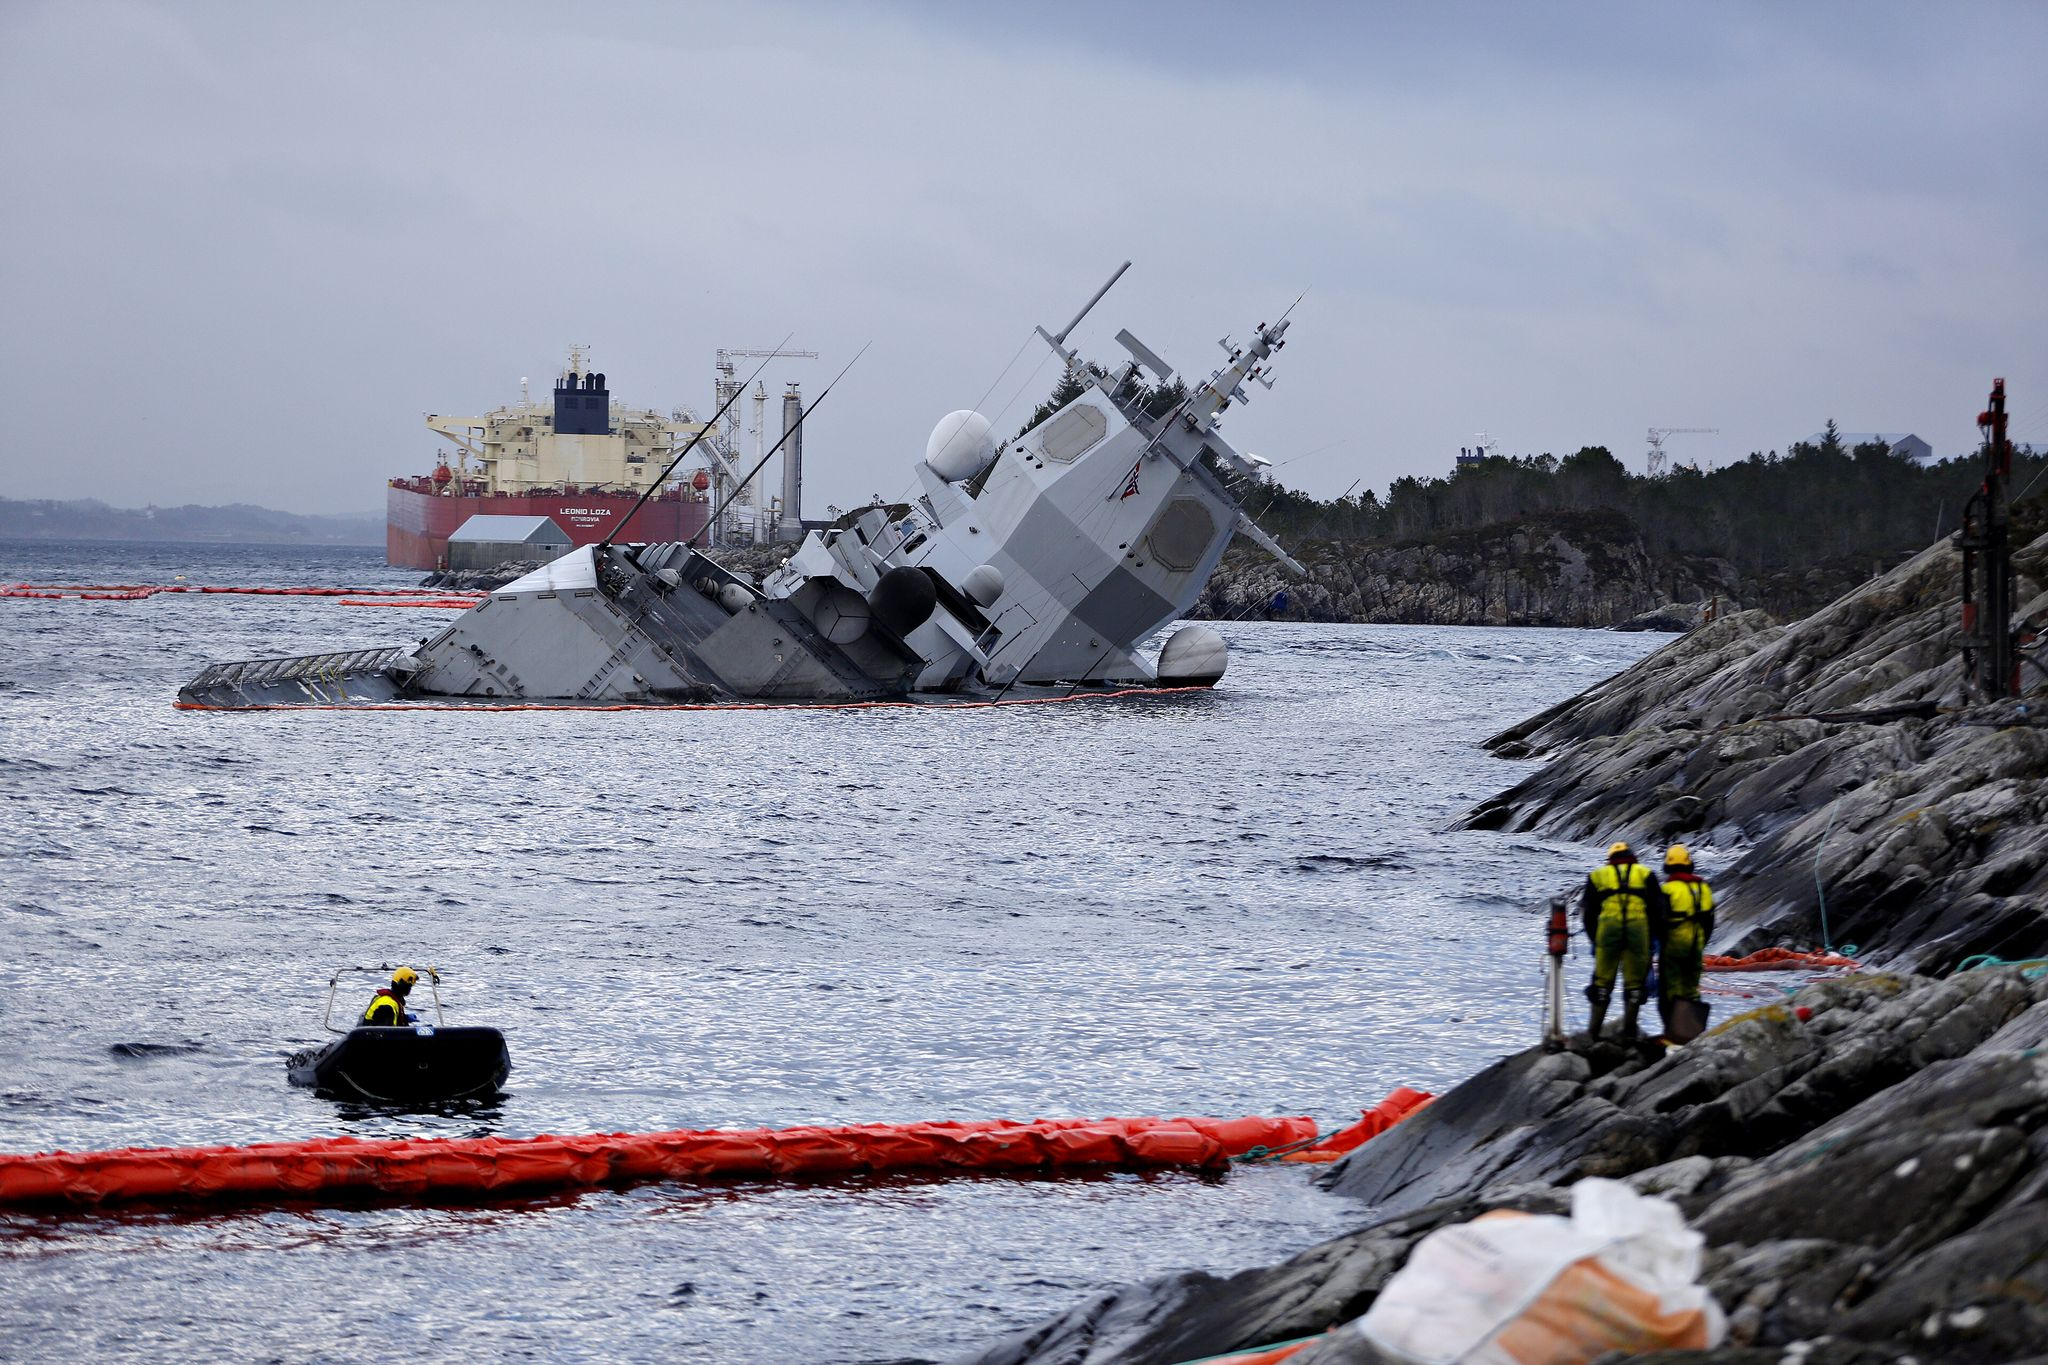 Затопленный норвежский фрегат Helge Ingstad